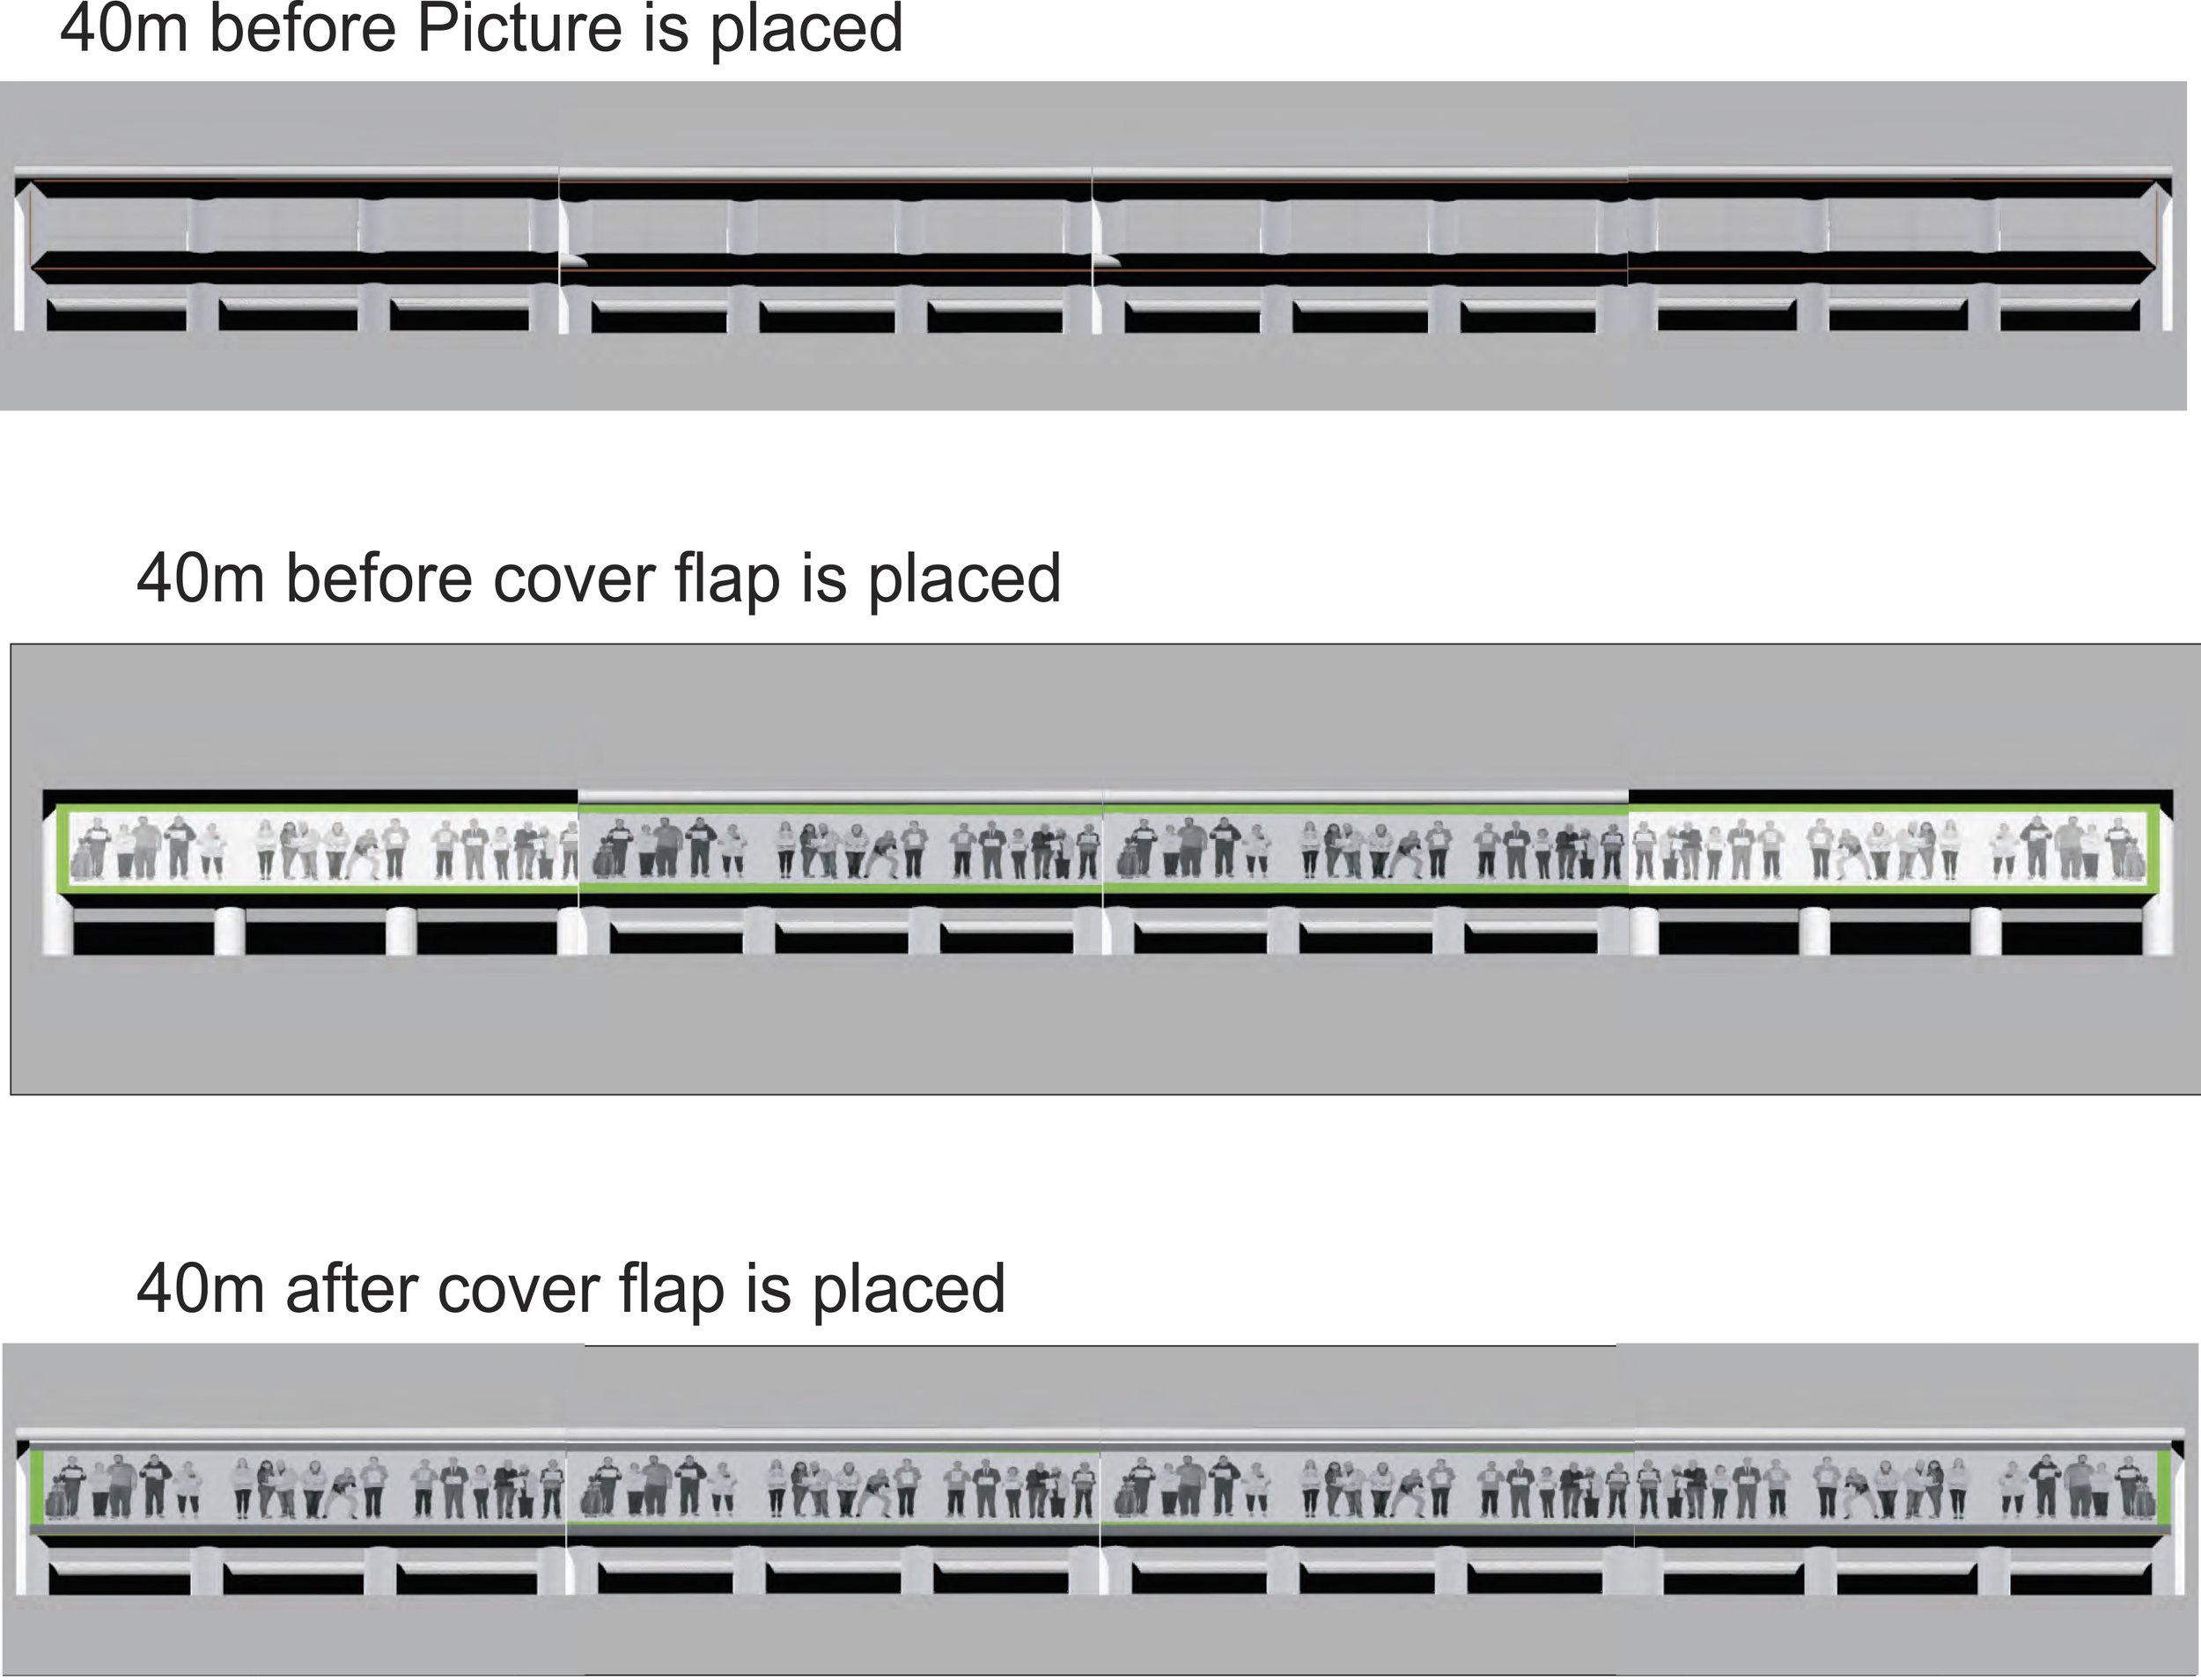 Production detailsLr-1.jpg